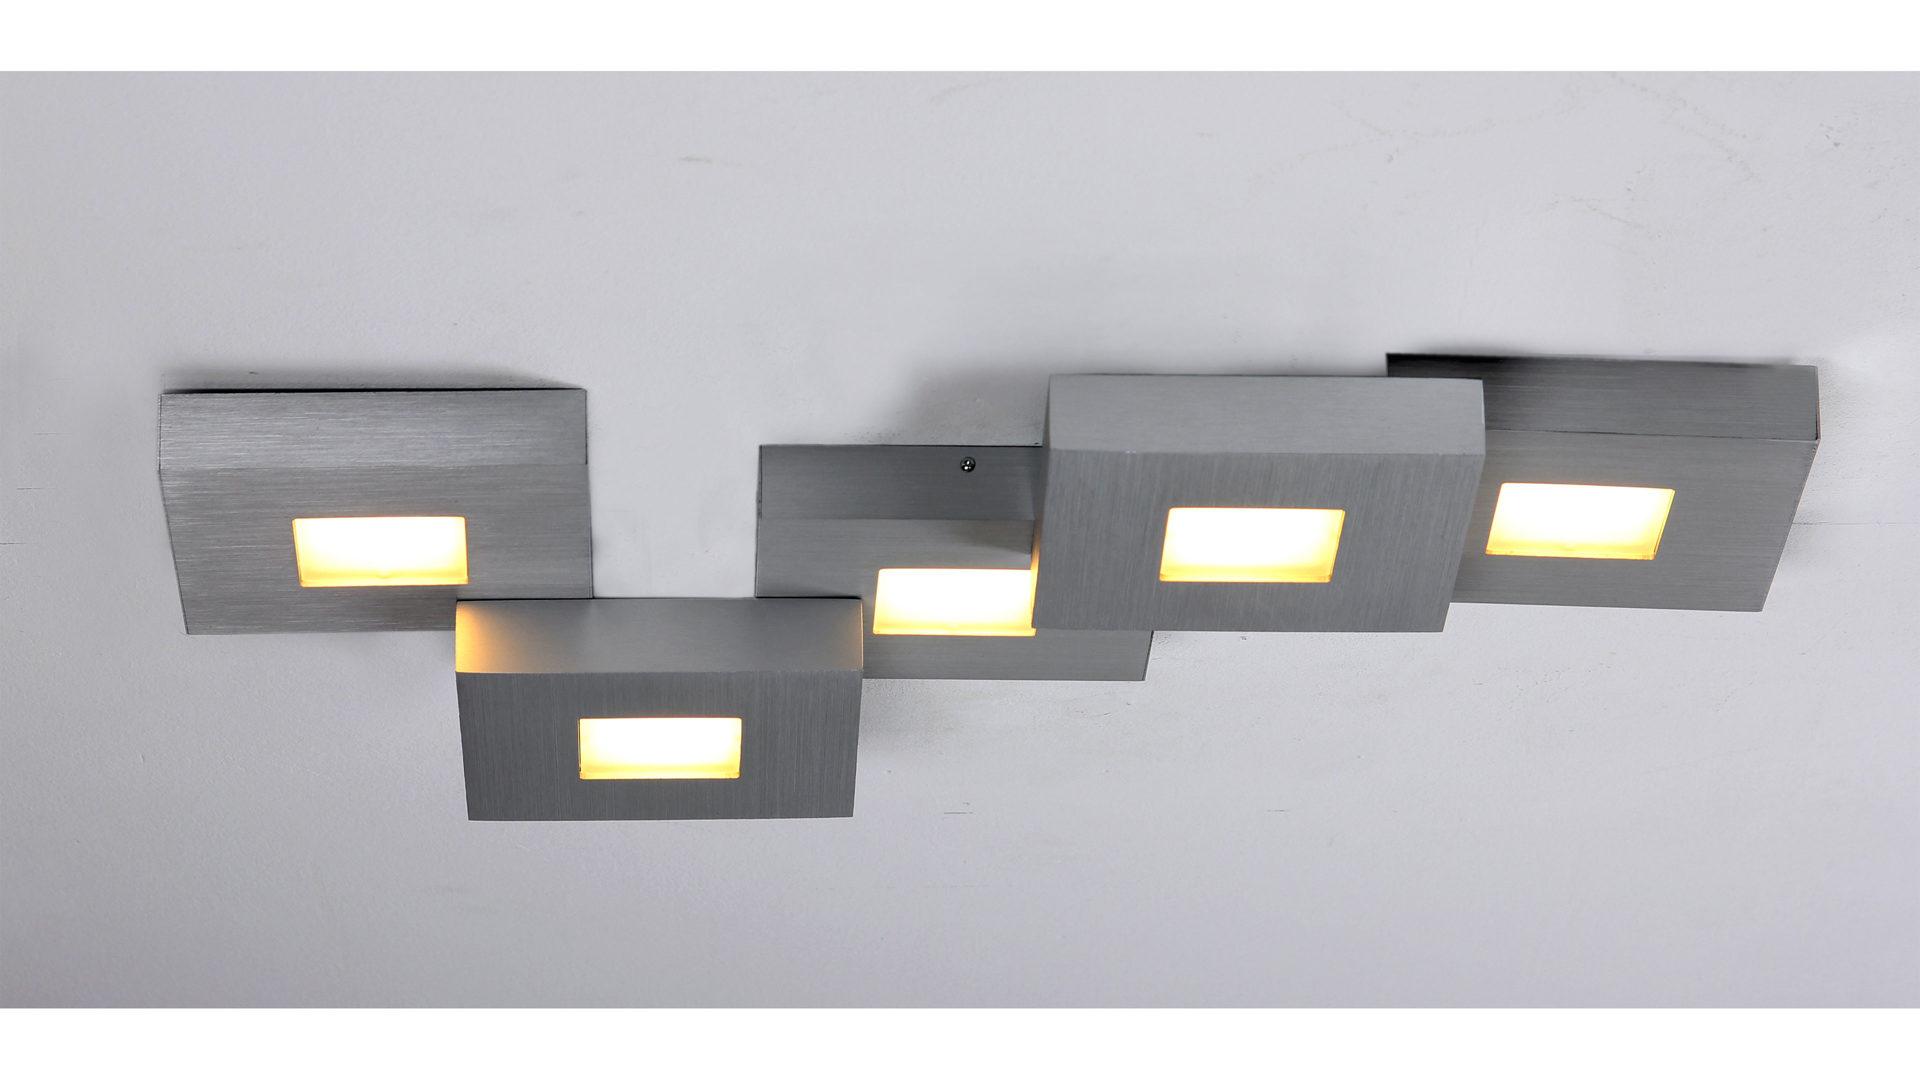 EINRICHTUNGSPARTNERRING, Räume, Küche, Lampen + Leuchten, BOPP, BOPP LED  Deckenleuchte Cubus, Aluminium   Länge Ca. 58 Cm